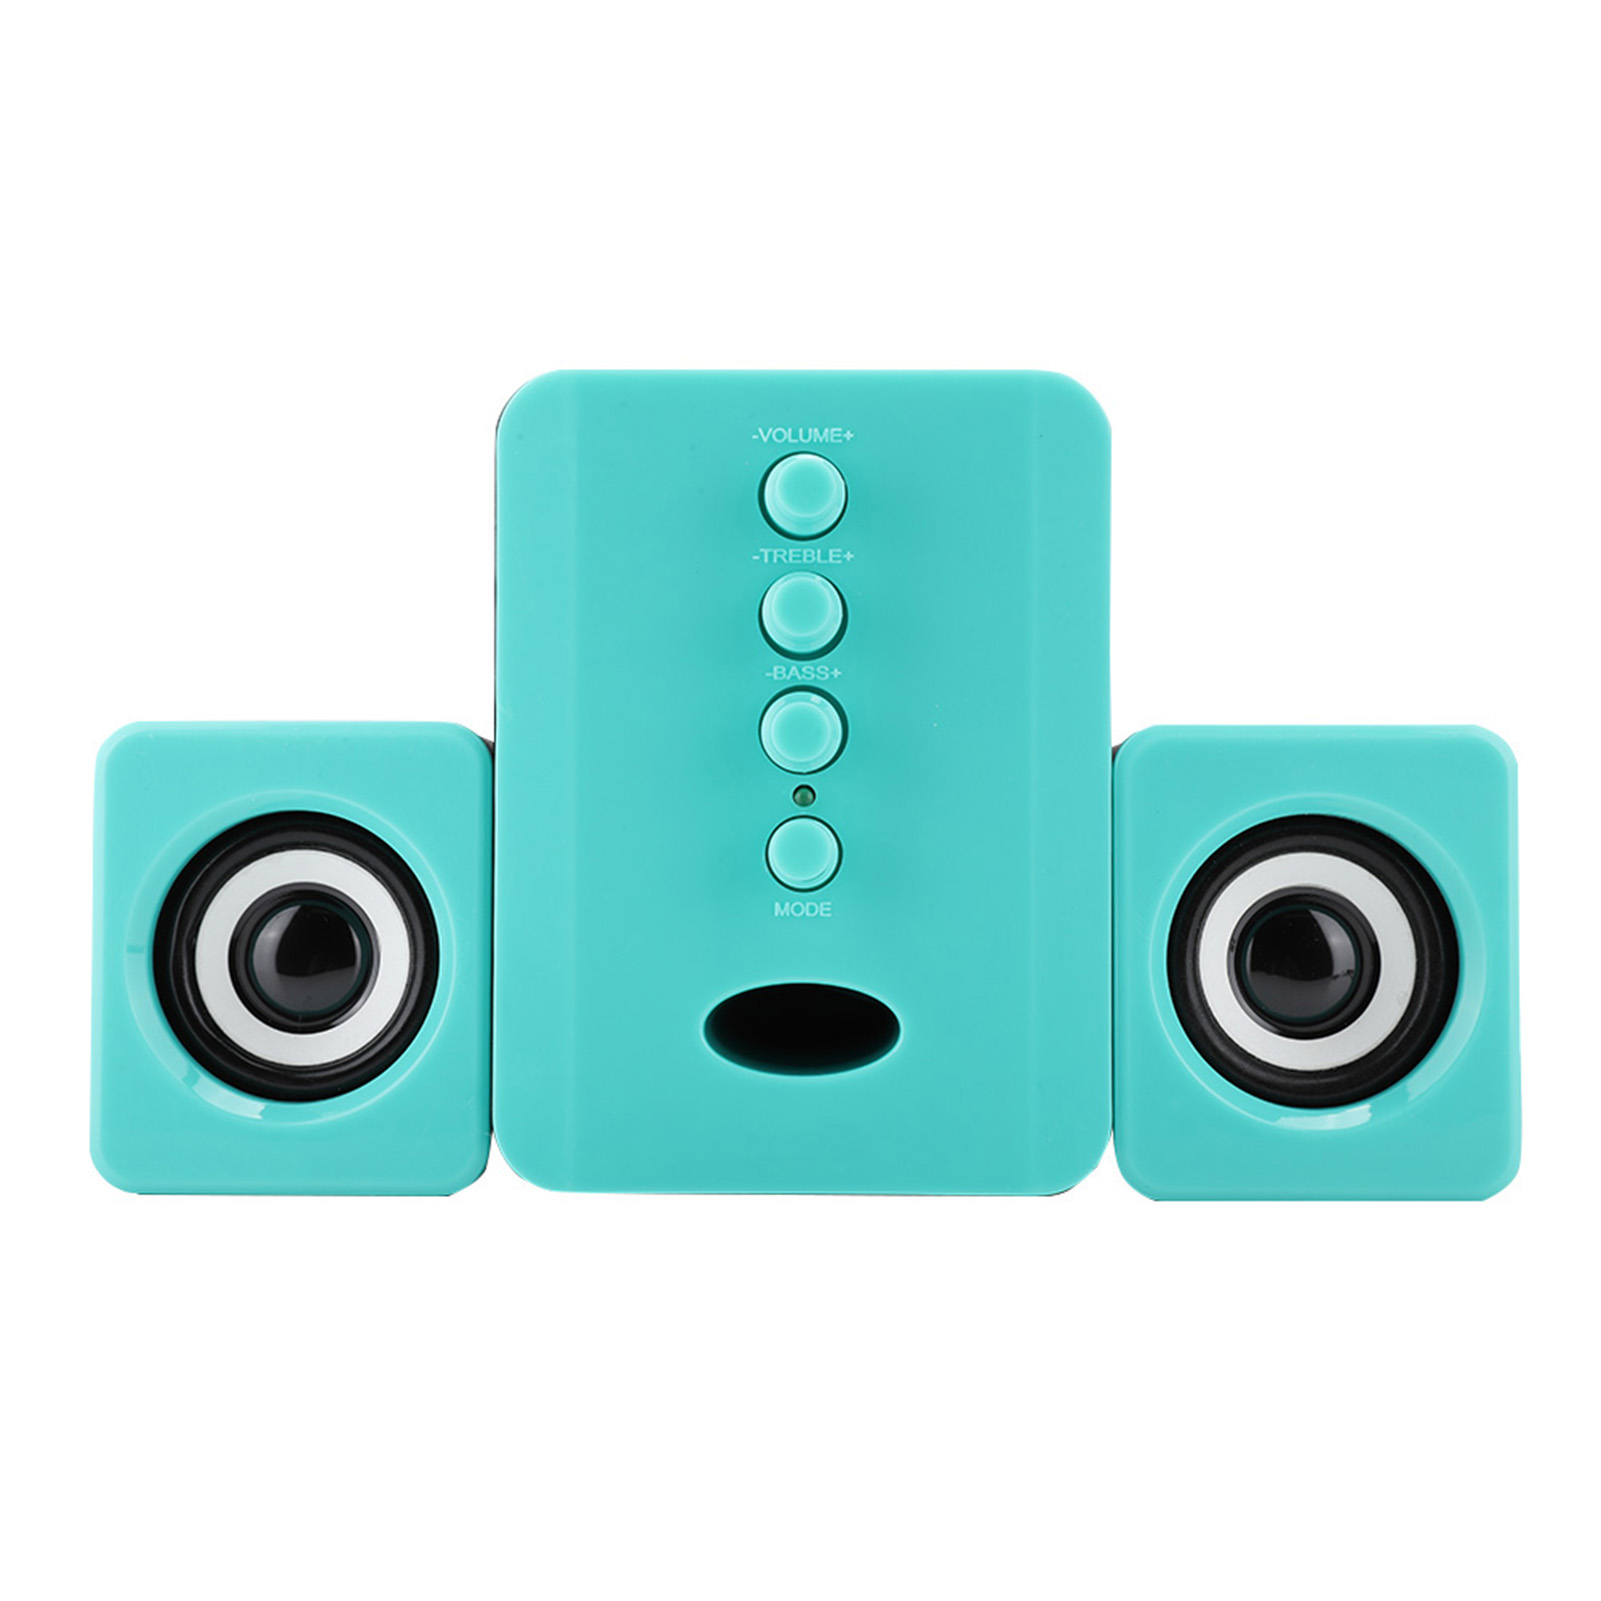 SADA-Bluetooth-Computer-Speaker-3-5mm-Desktop-Laptop-PC-Stereo-Bass-Subwoofer-SS thumbnail 83